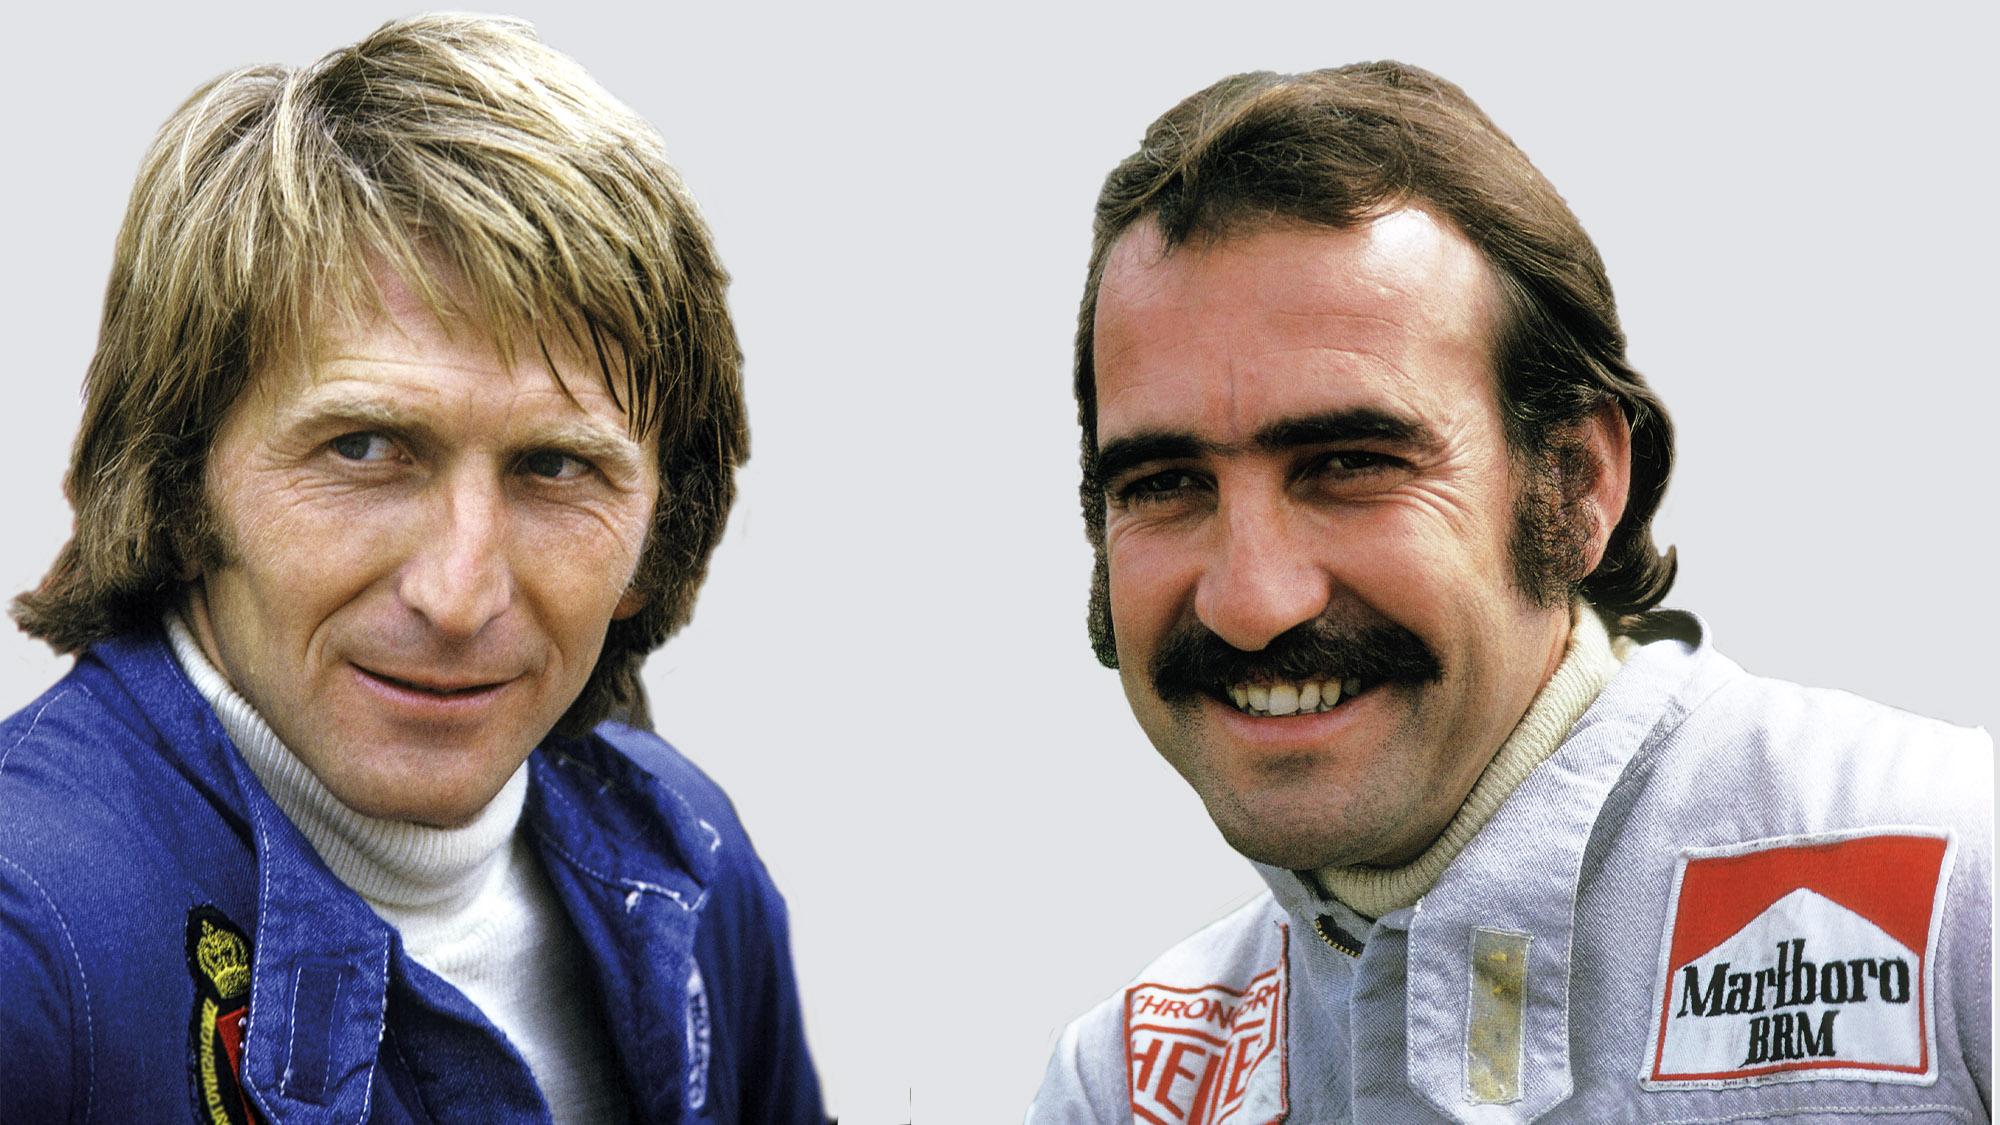 Derek Bell and Clay Regazzoni